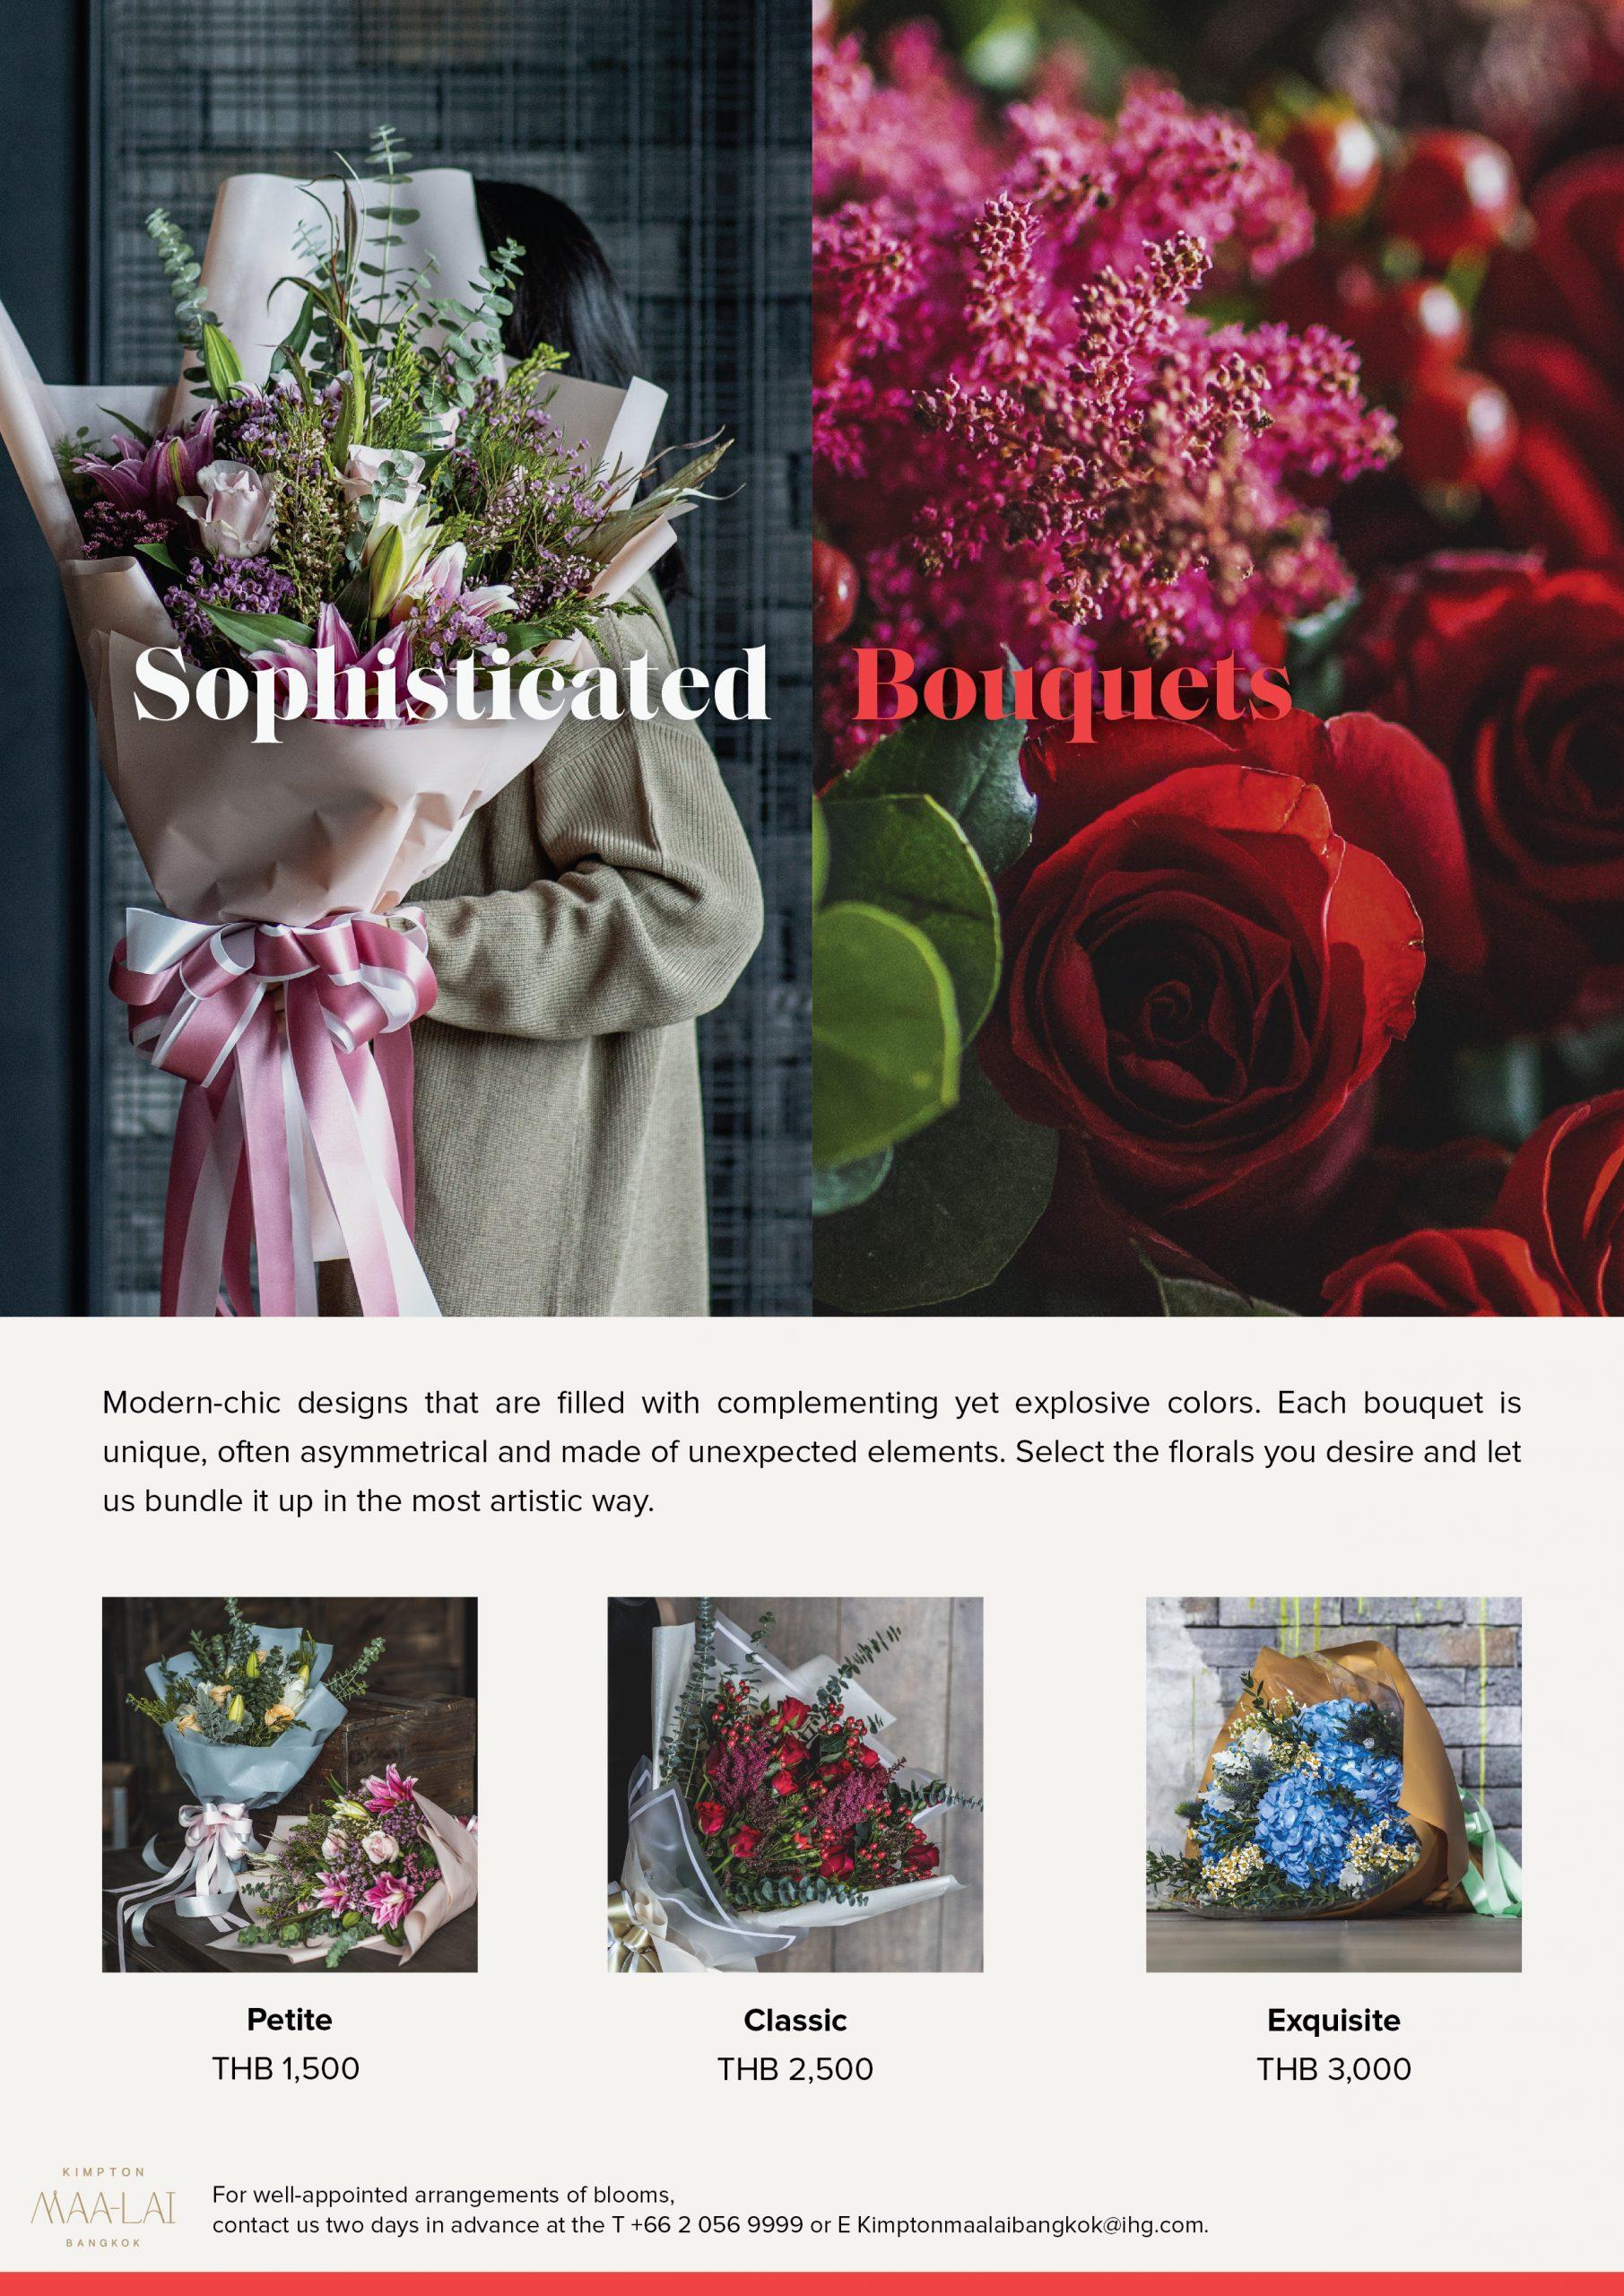 Flower Shop Kimpton Maa-Lai Bangkok